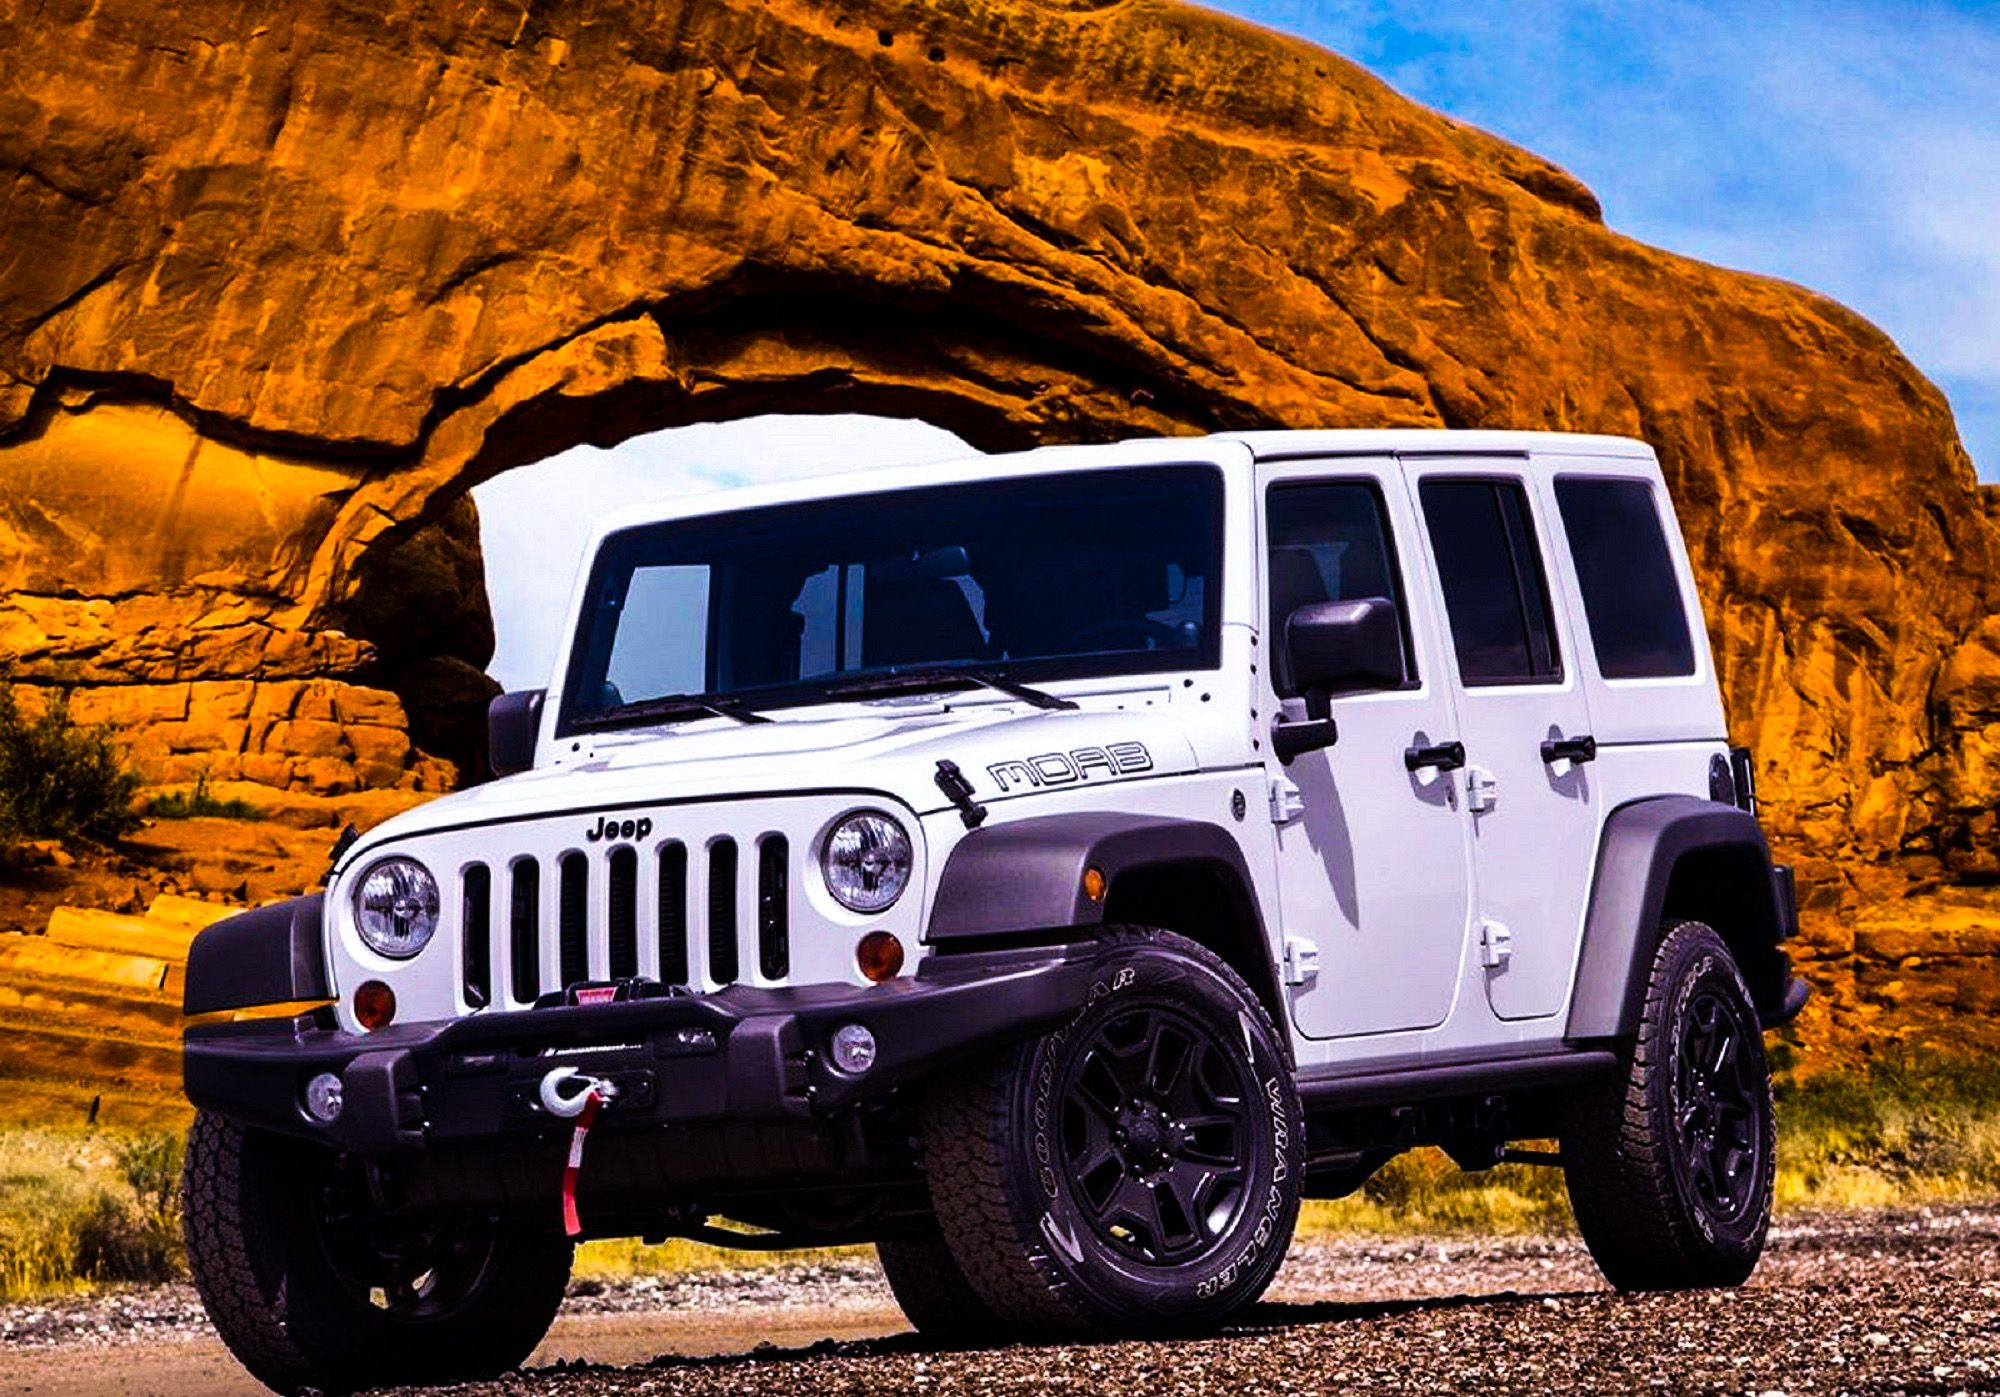 2014 White Jeep Wrangler Diesel 4Door MOAB. Jeep